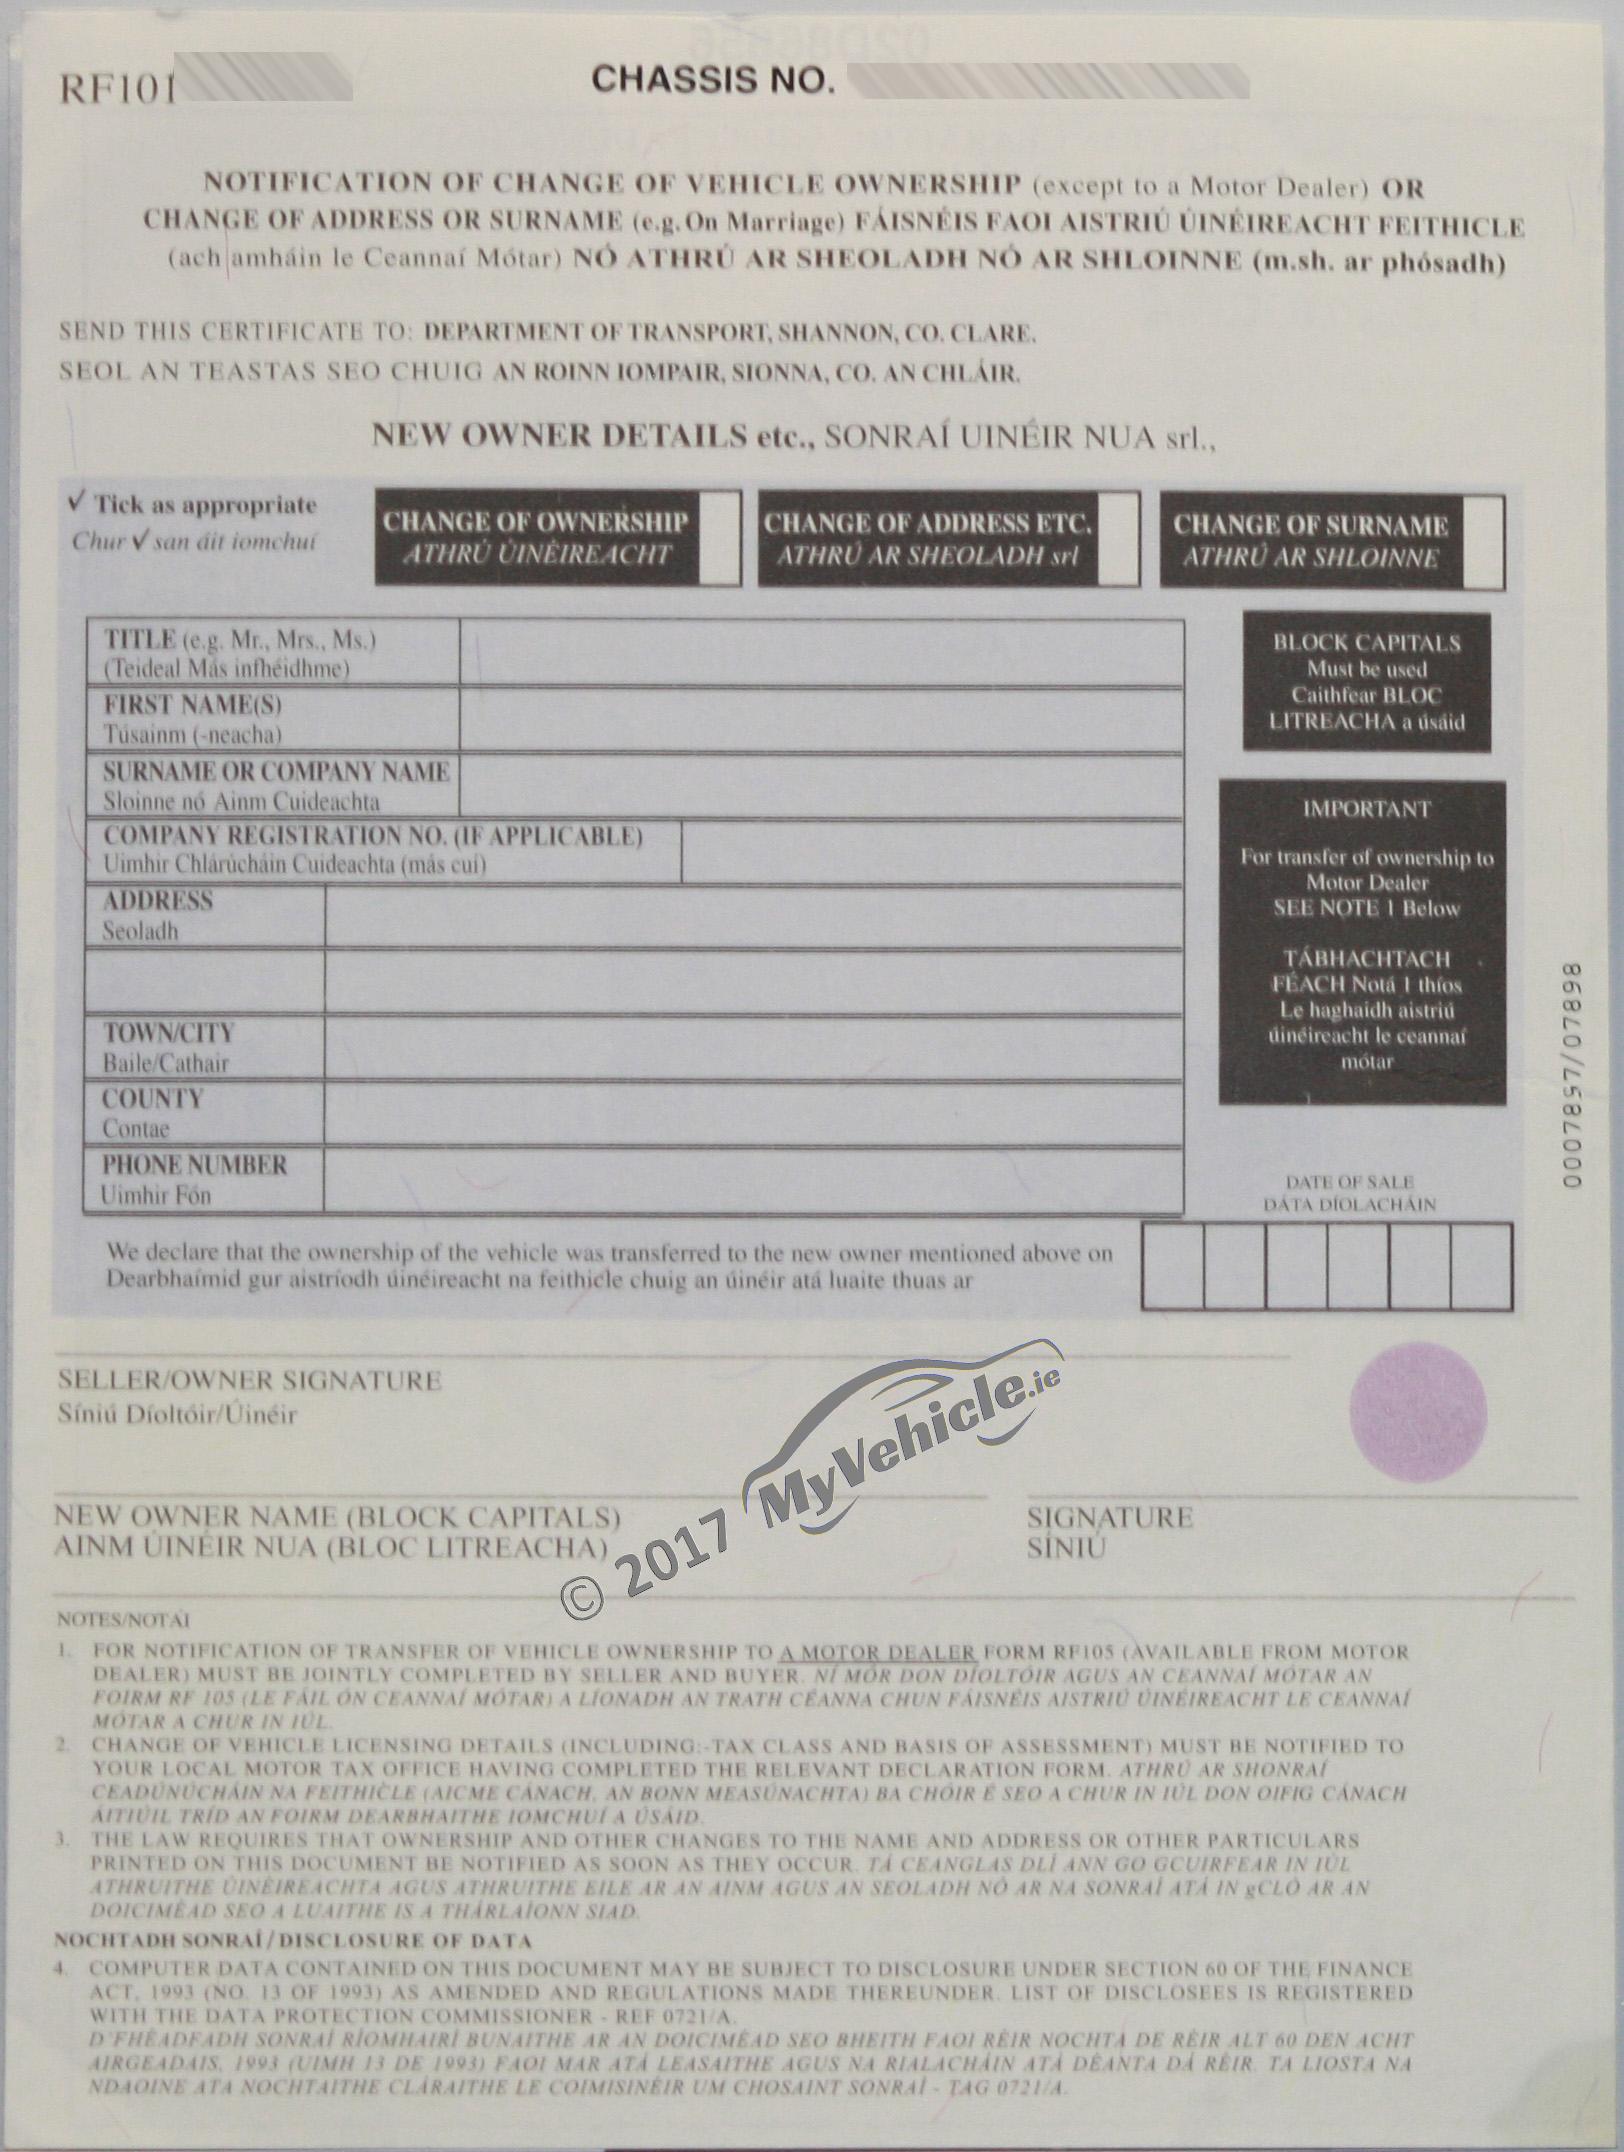 fake vehicle licensing certificates vlc logbooks